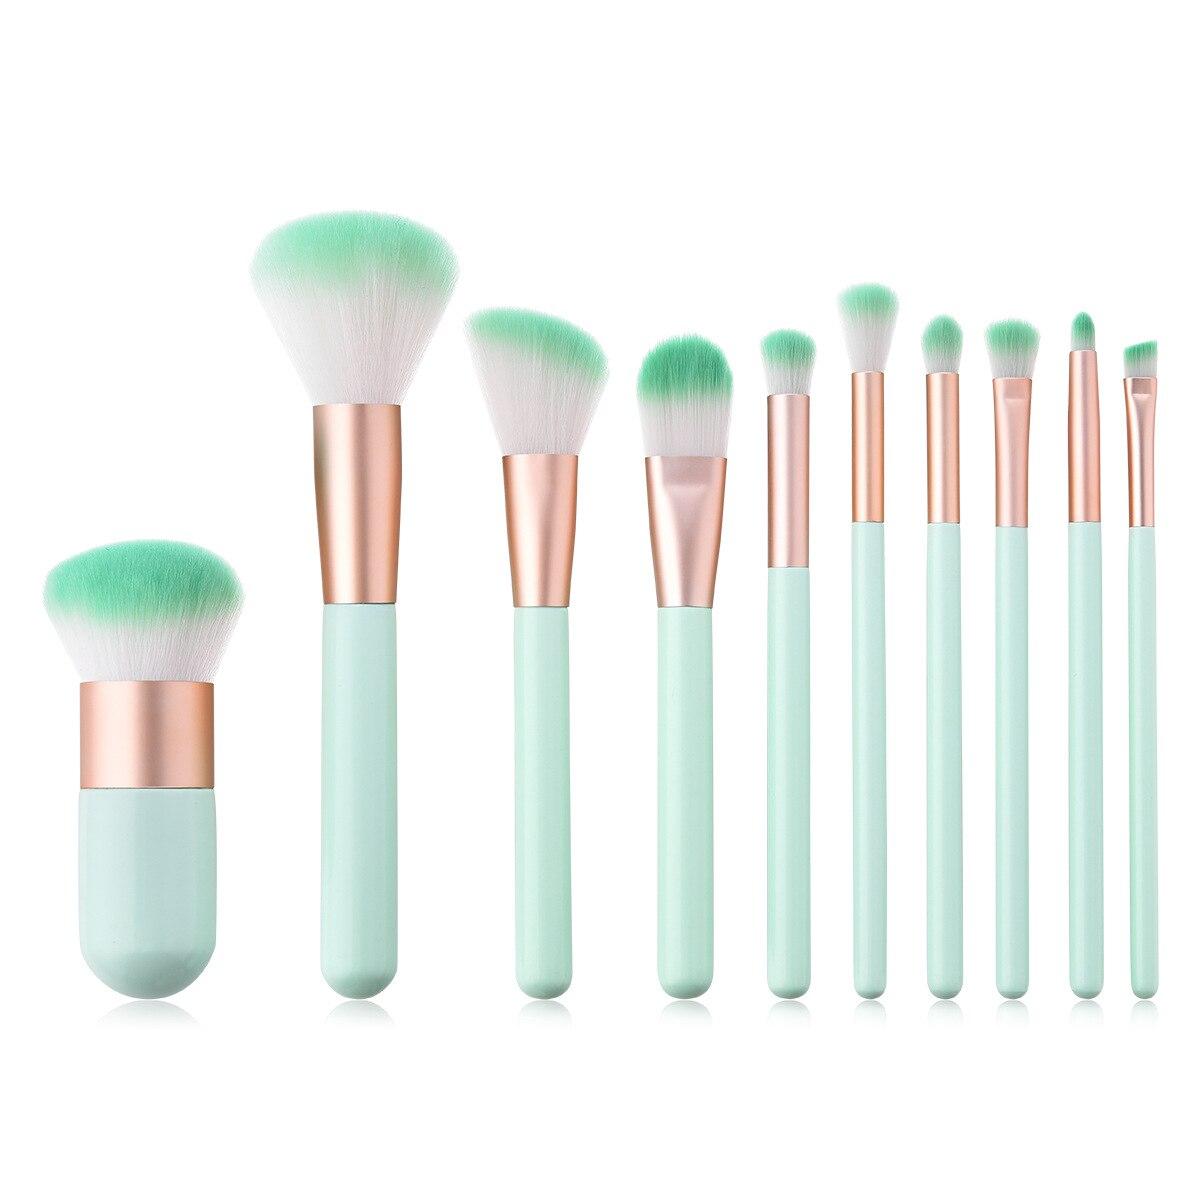 57f1b4ee0 BBL 10 piezas Premium pinceles maquillaje sombra de ojos en polvo cepillo  Blush reales menta verde maquillaje cepillo Kit, Maquiagem profesional